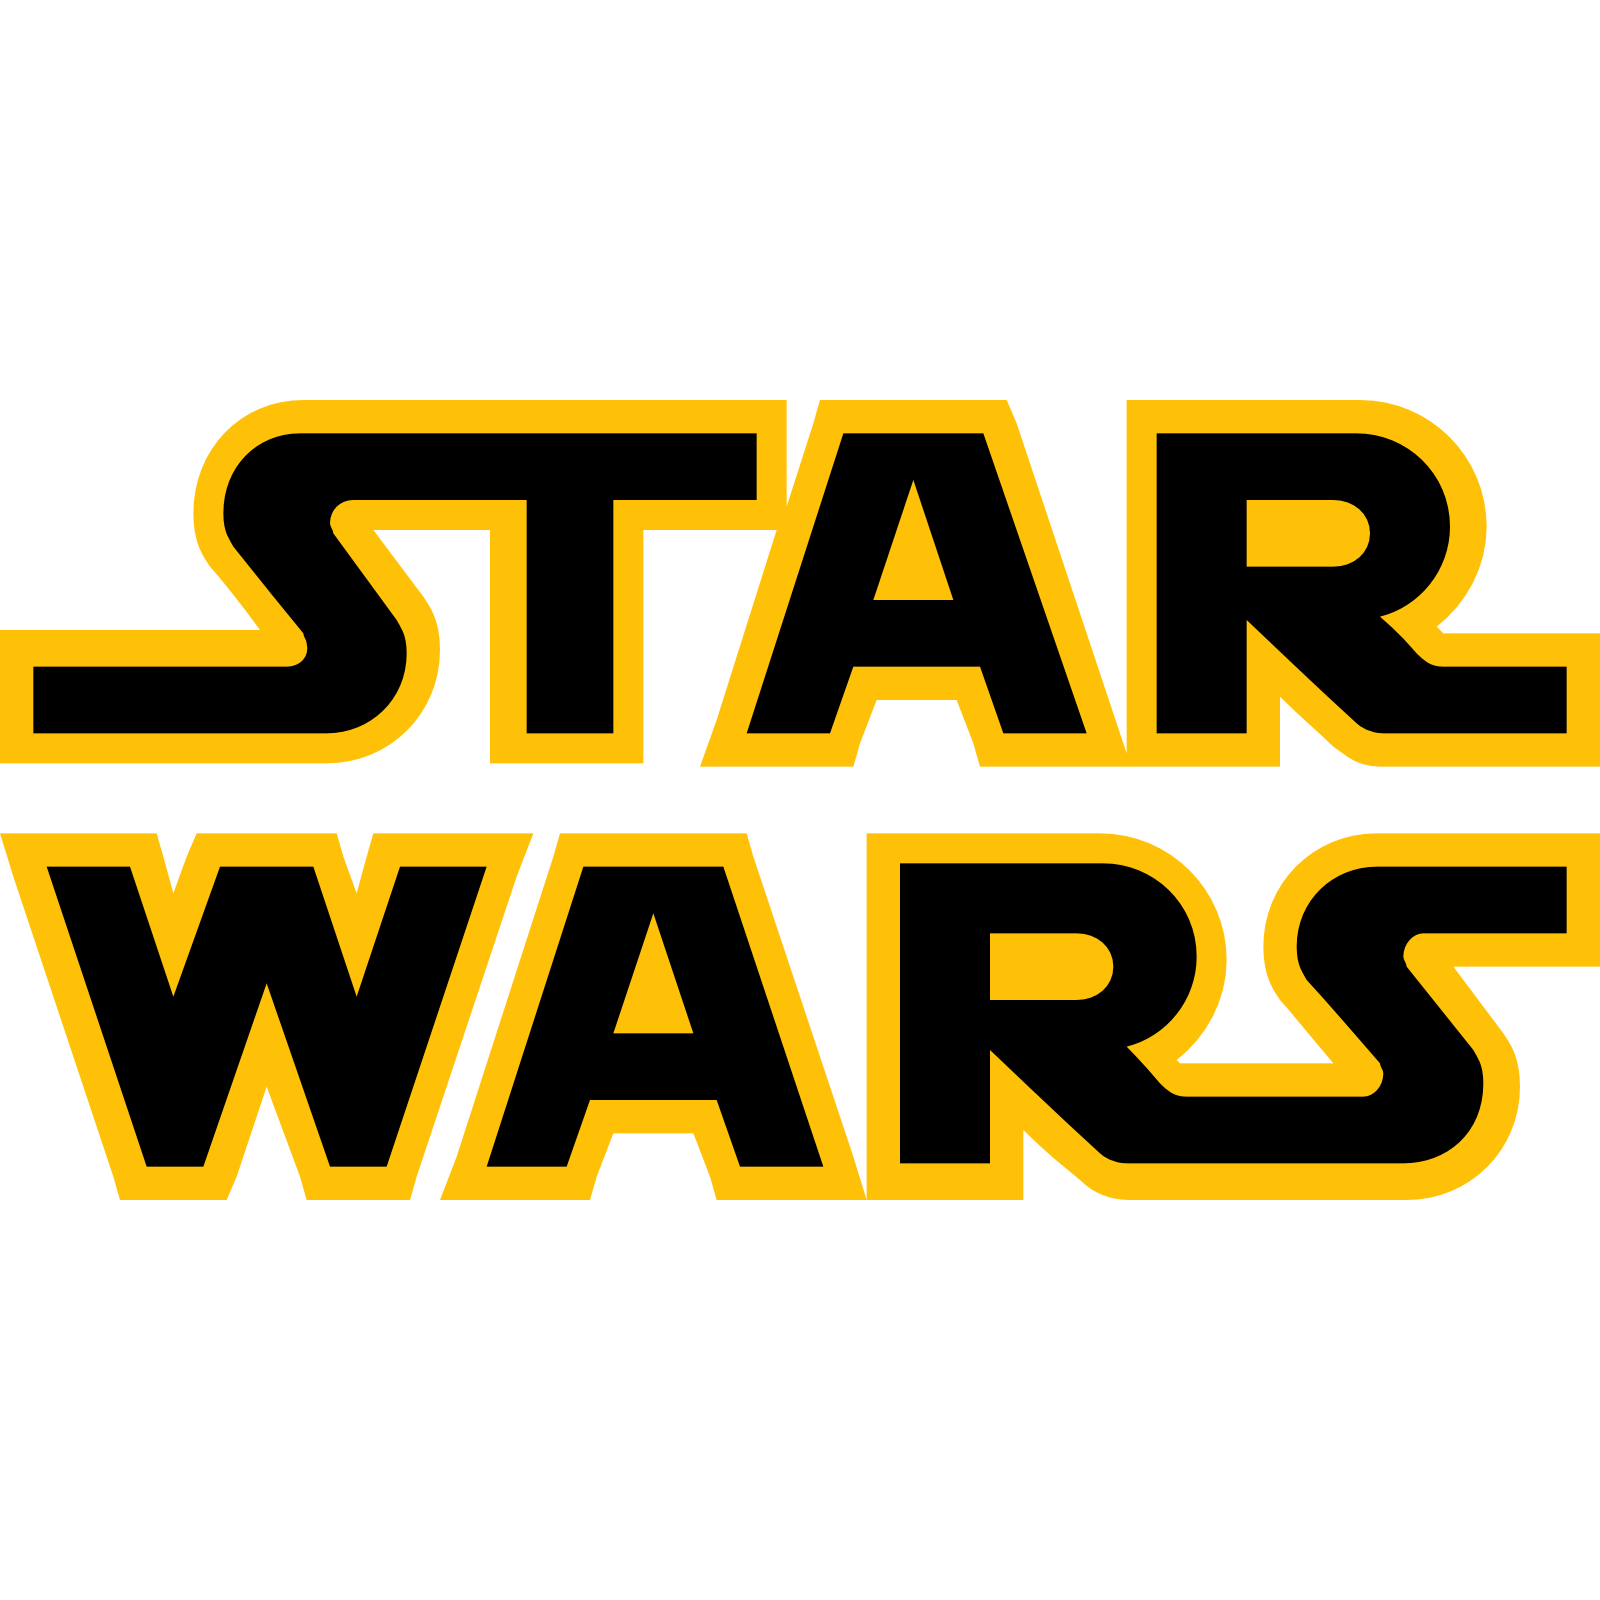 PNG Star Wars - 59898